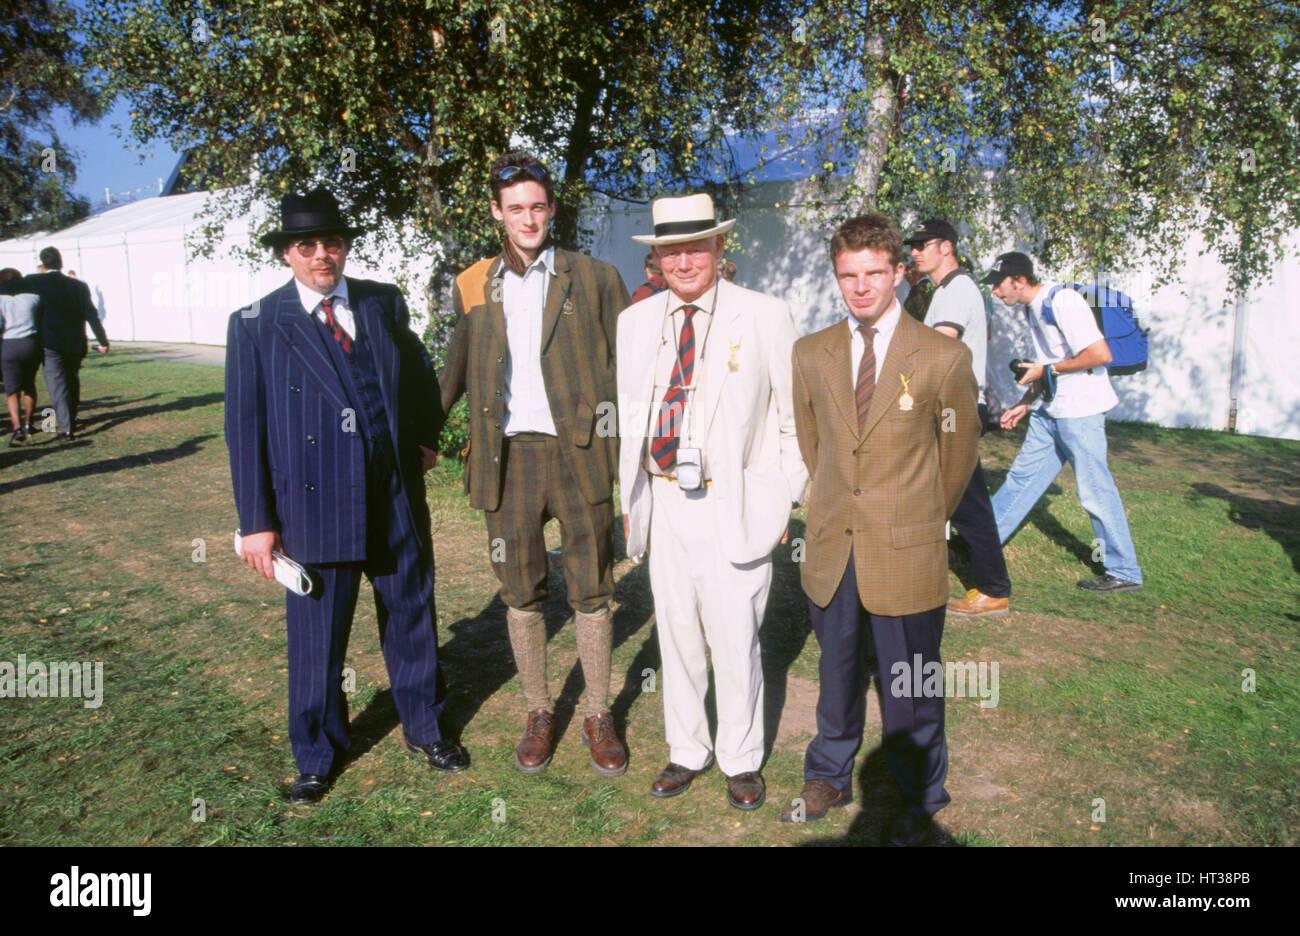 Lord Montagu, Jonathan Montagu und Justin Keen 1998 beim Goodwood Revival, Künstler: unbekannt. Stockbild